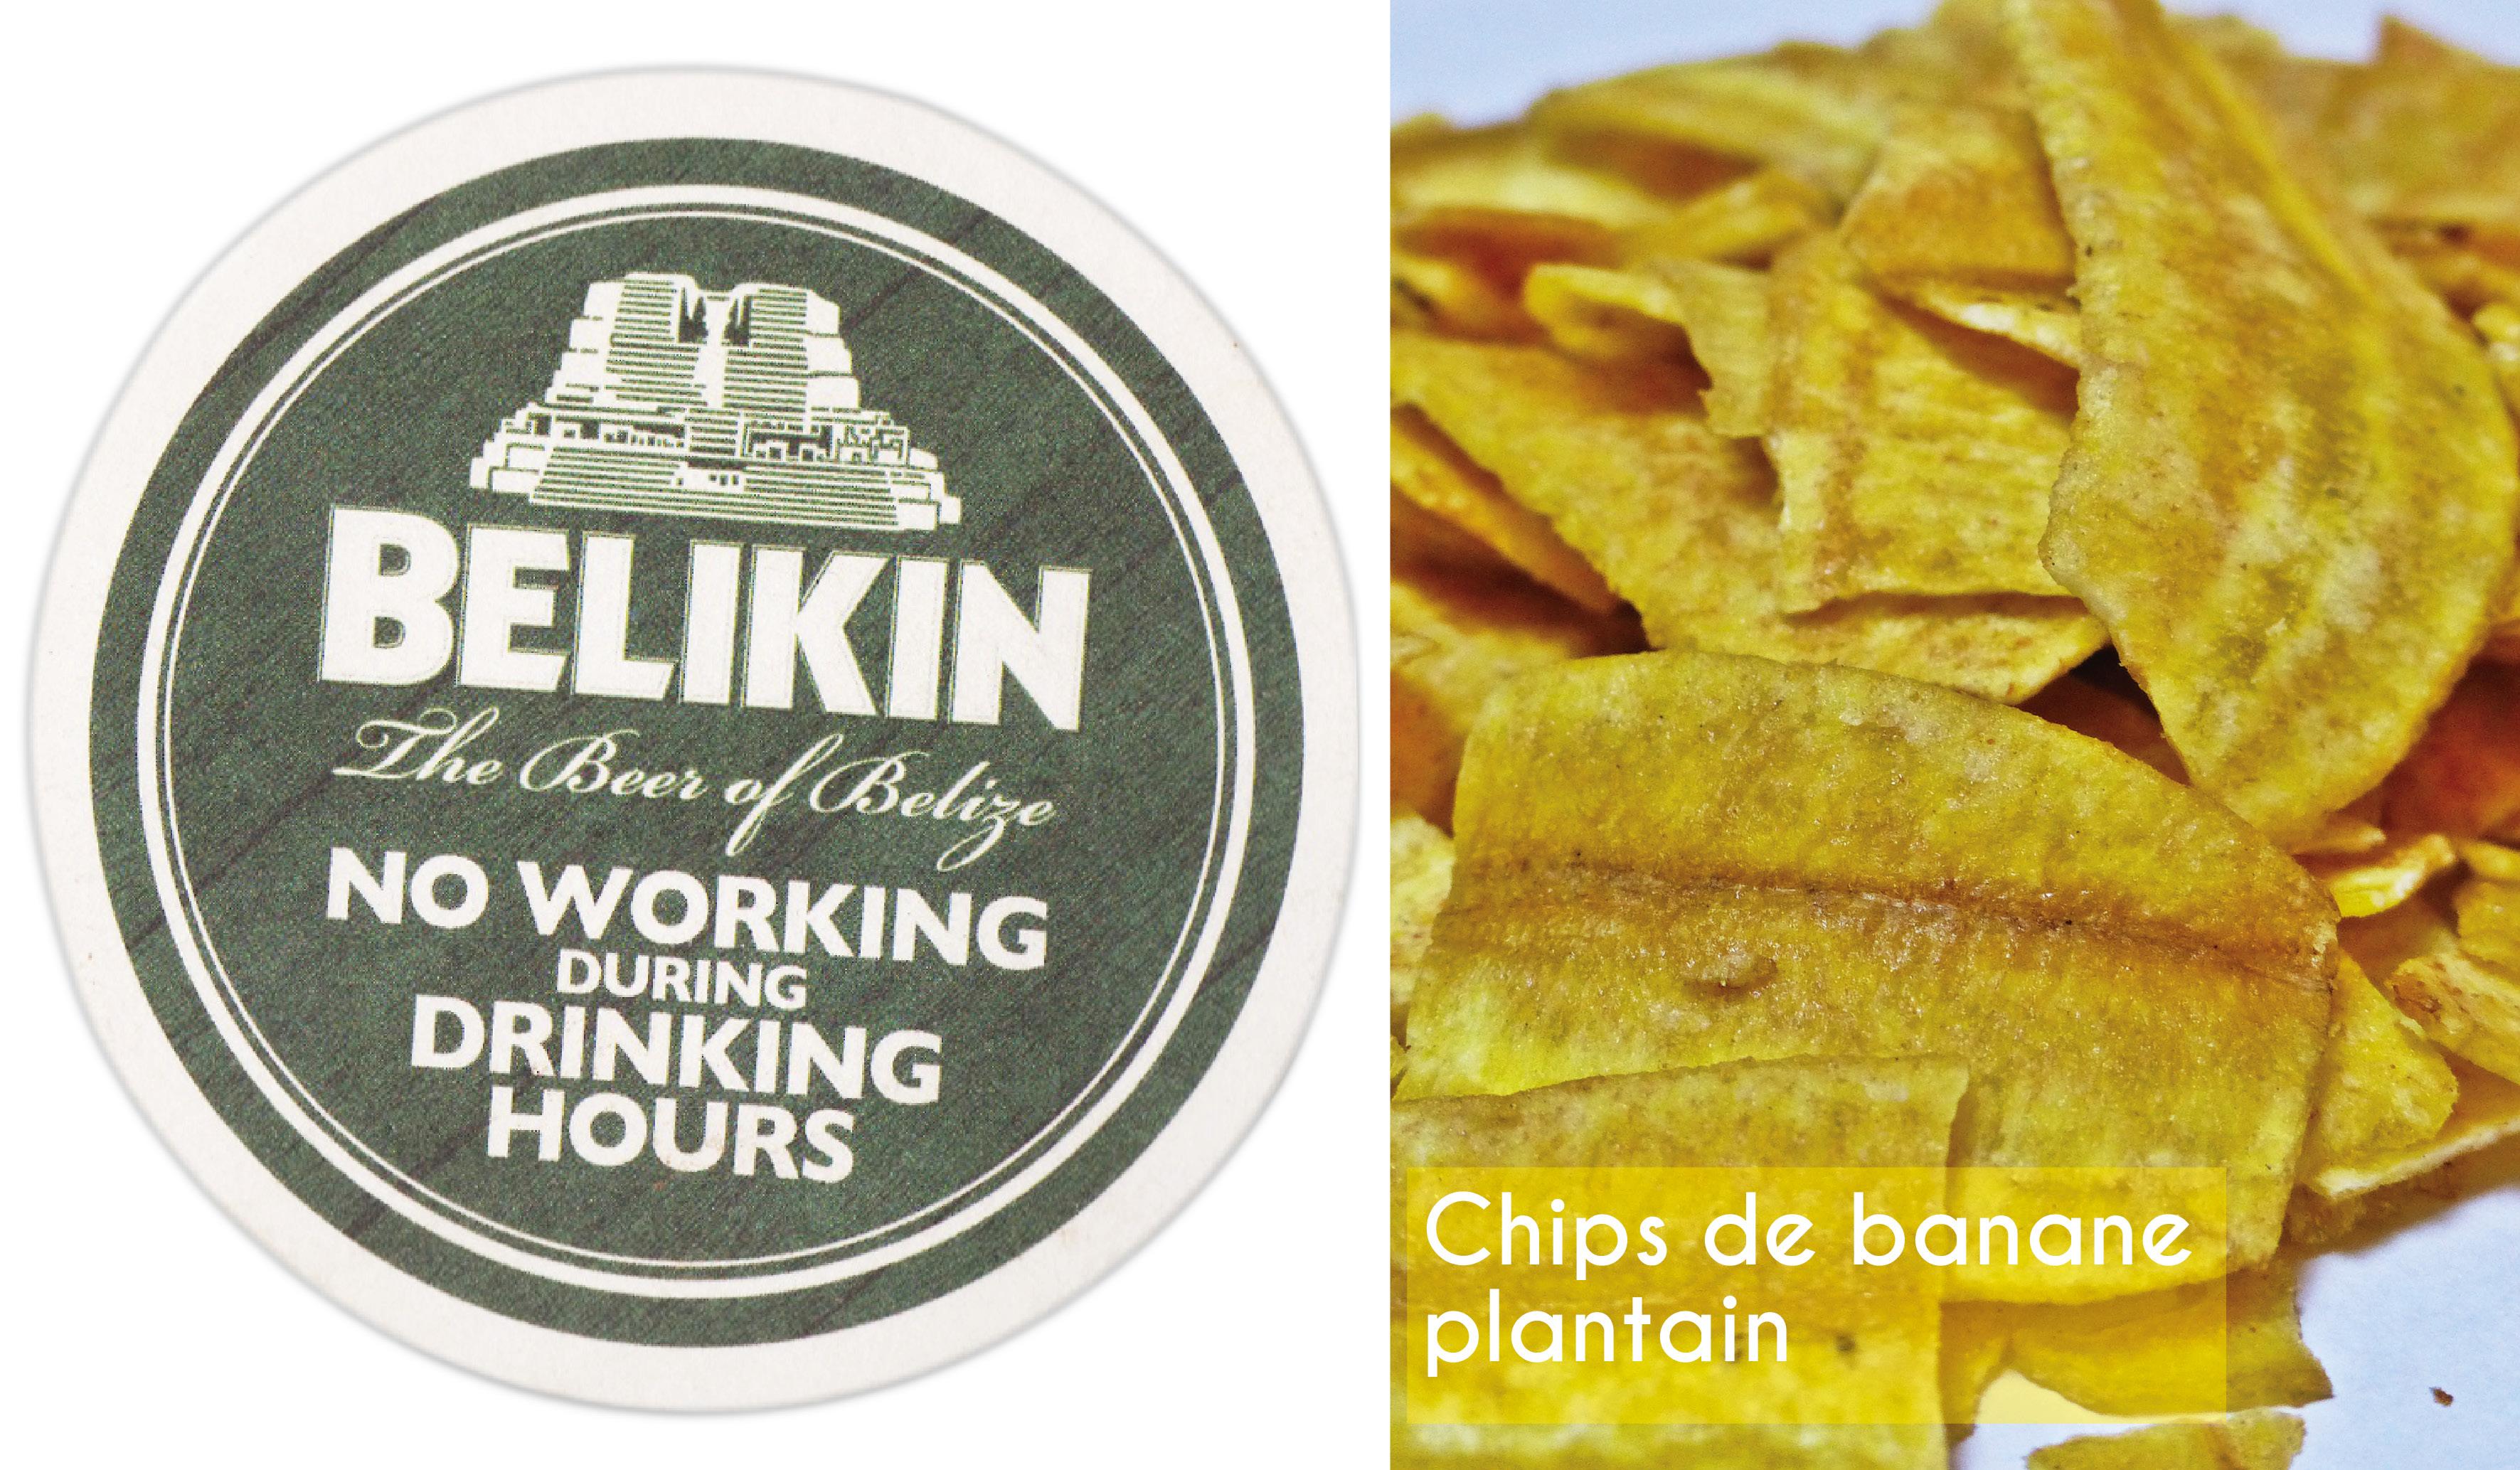 belize, cuisine, banane, plantain, bière, belikin, chips,